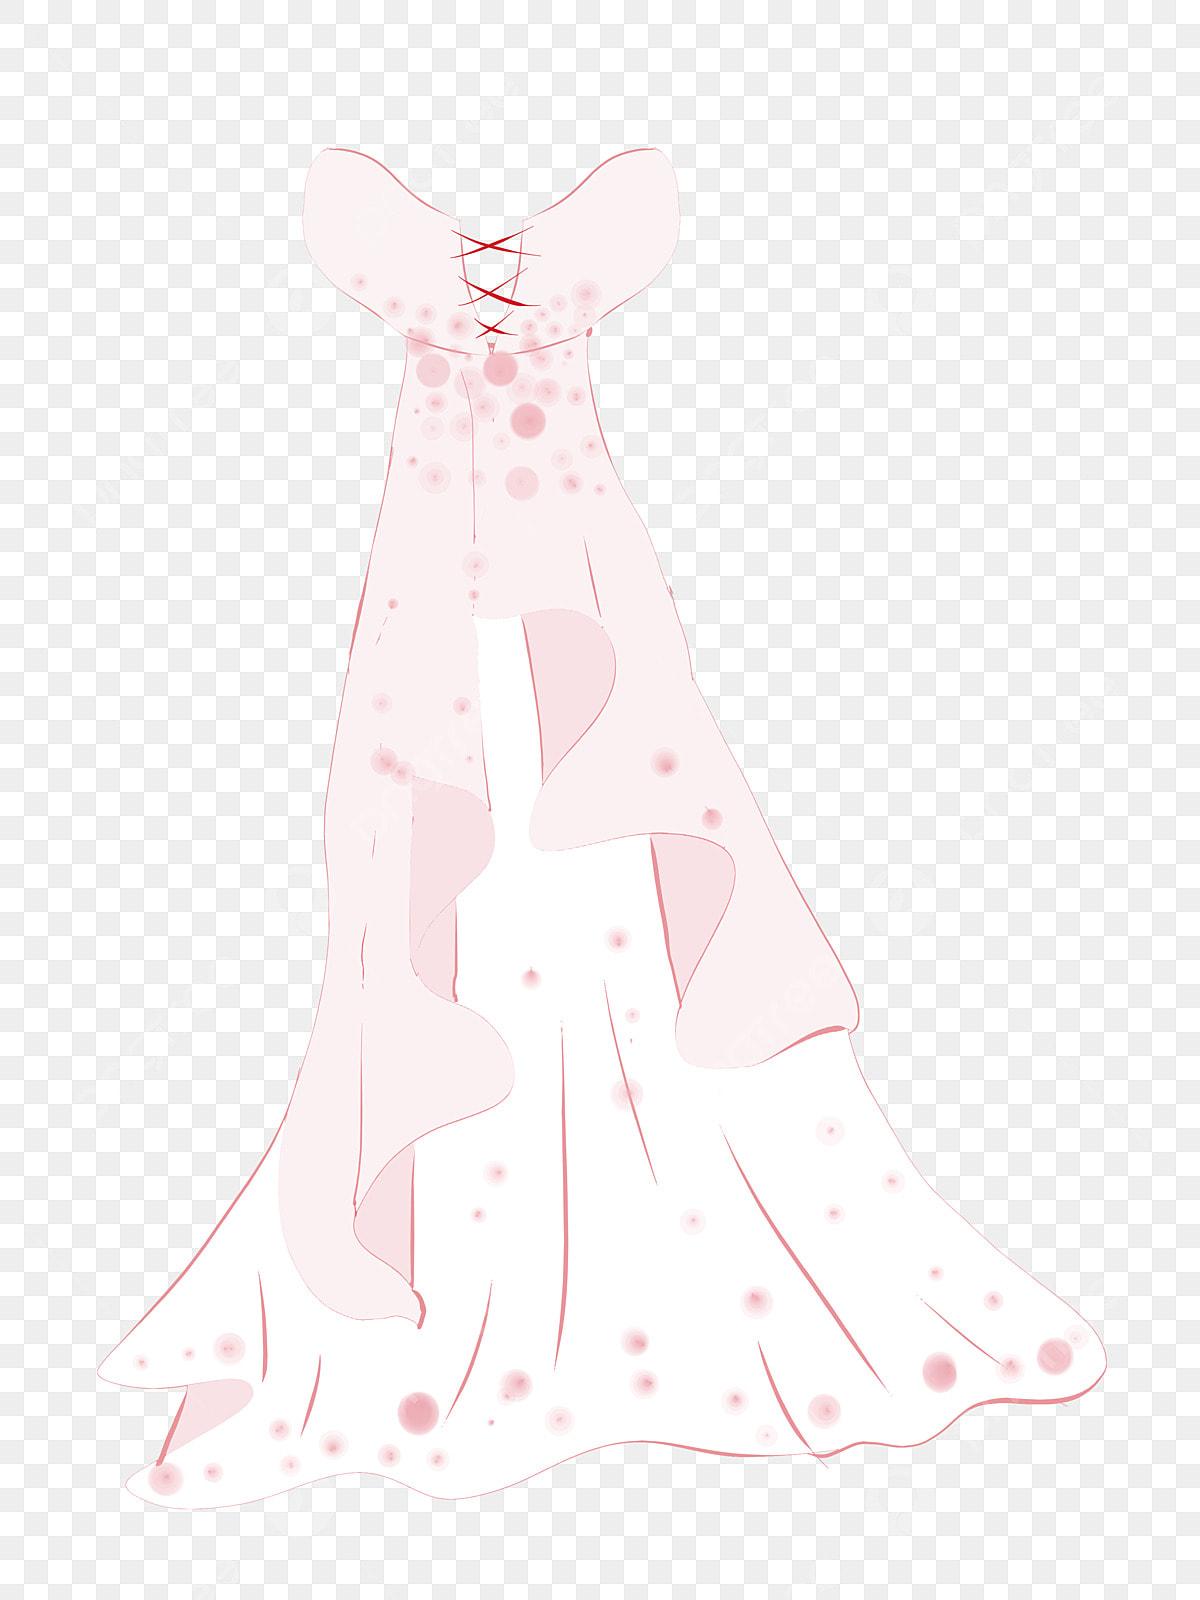 Puteri Pengantin Perempuan Yang Paling Cantik Berpakaian